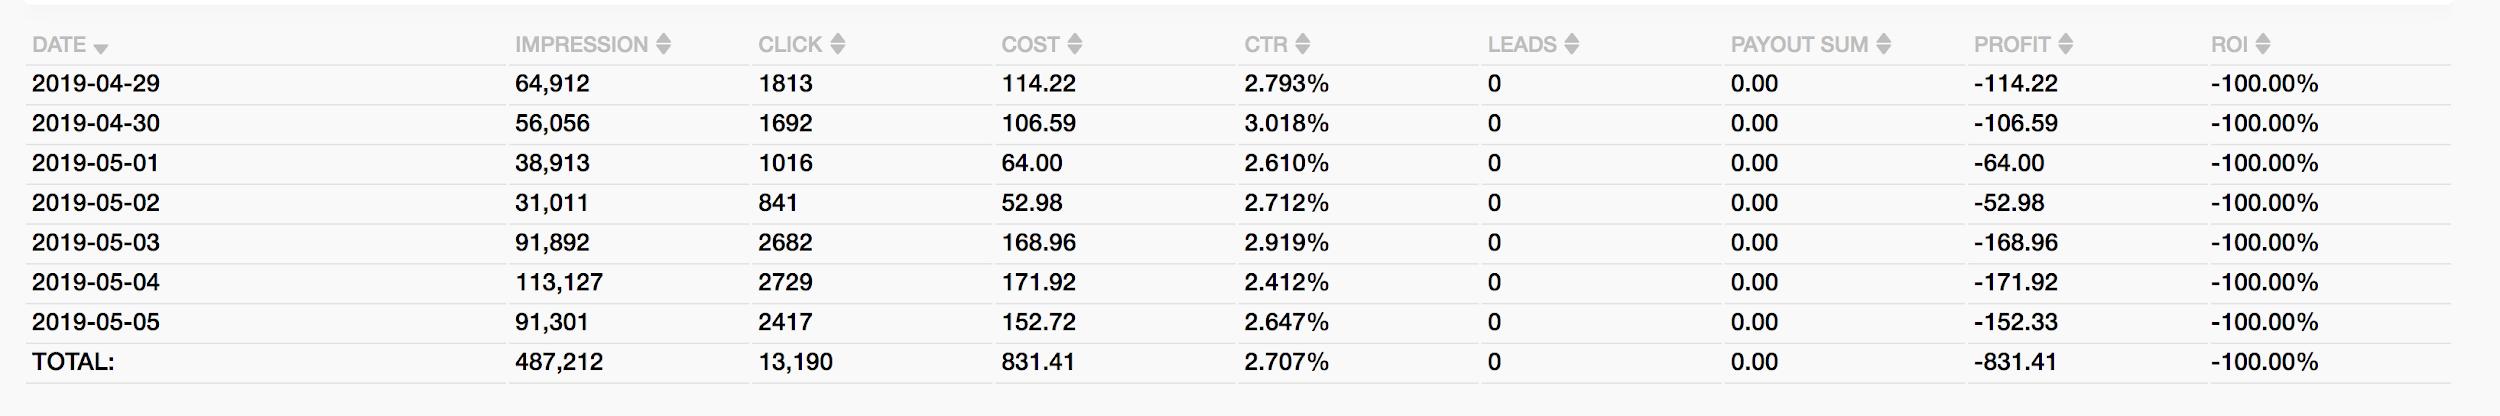 %D0%A1%D1%82%D0%B0%D1%82%D0%B8%D1%81%D1%82%D0%B8%D0%BA%D0%B0-Datspush.png